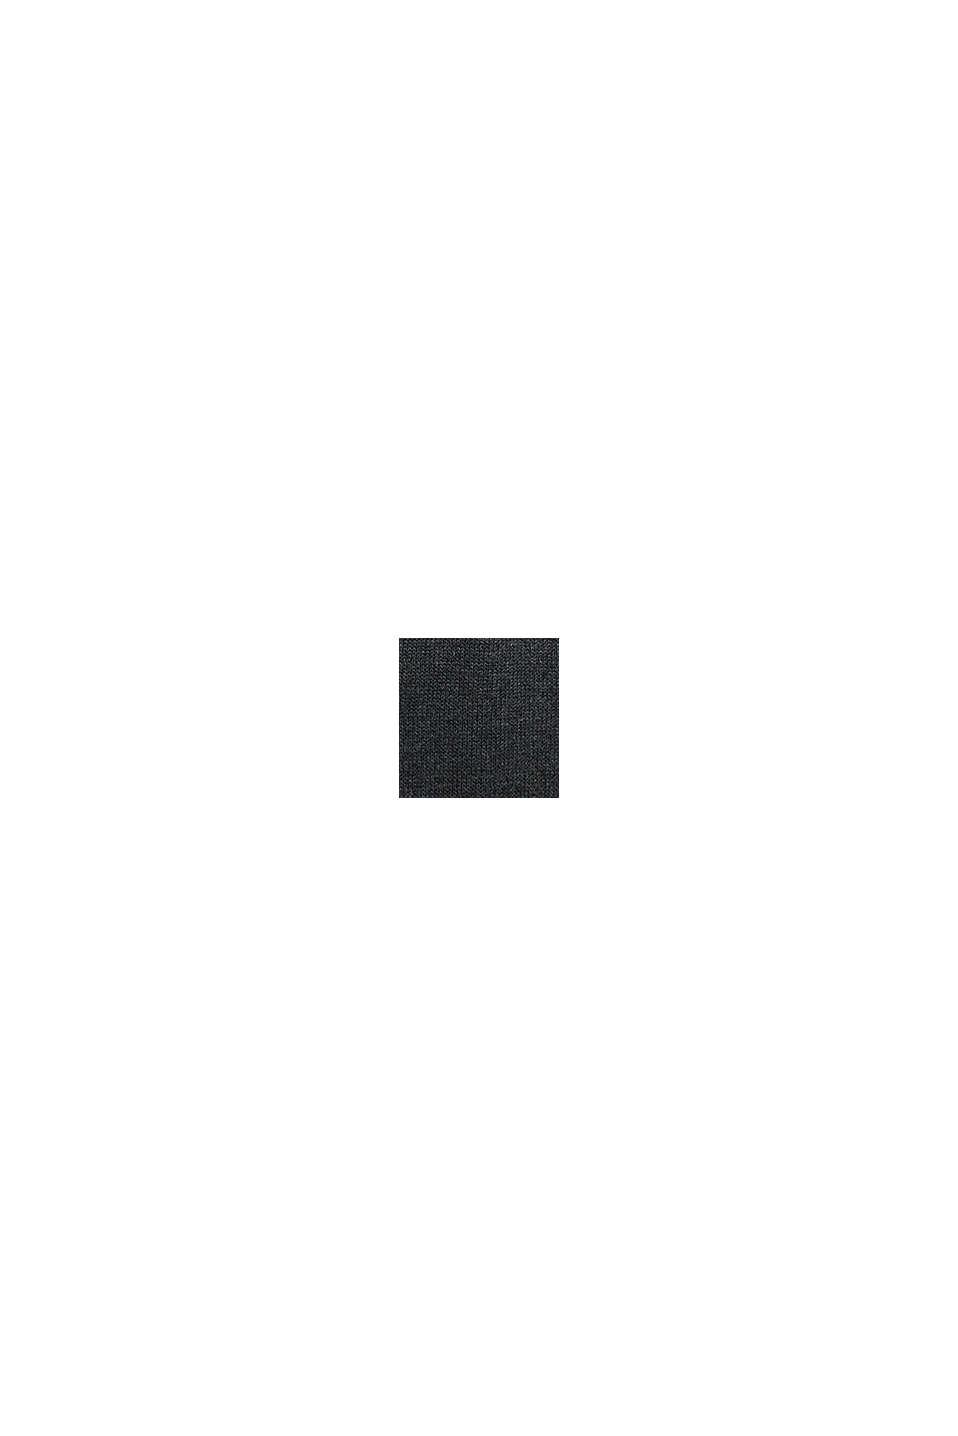 Laine/coton biologique: le pull-over jacquard, DARK GREY, swatch